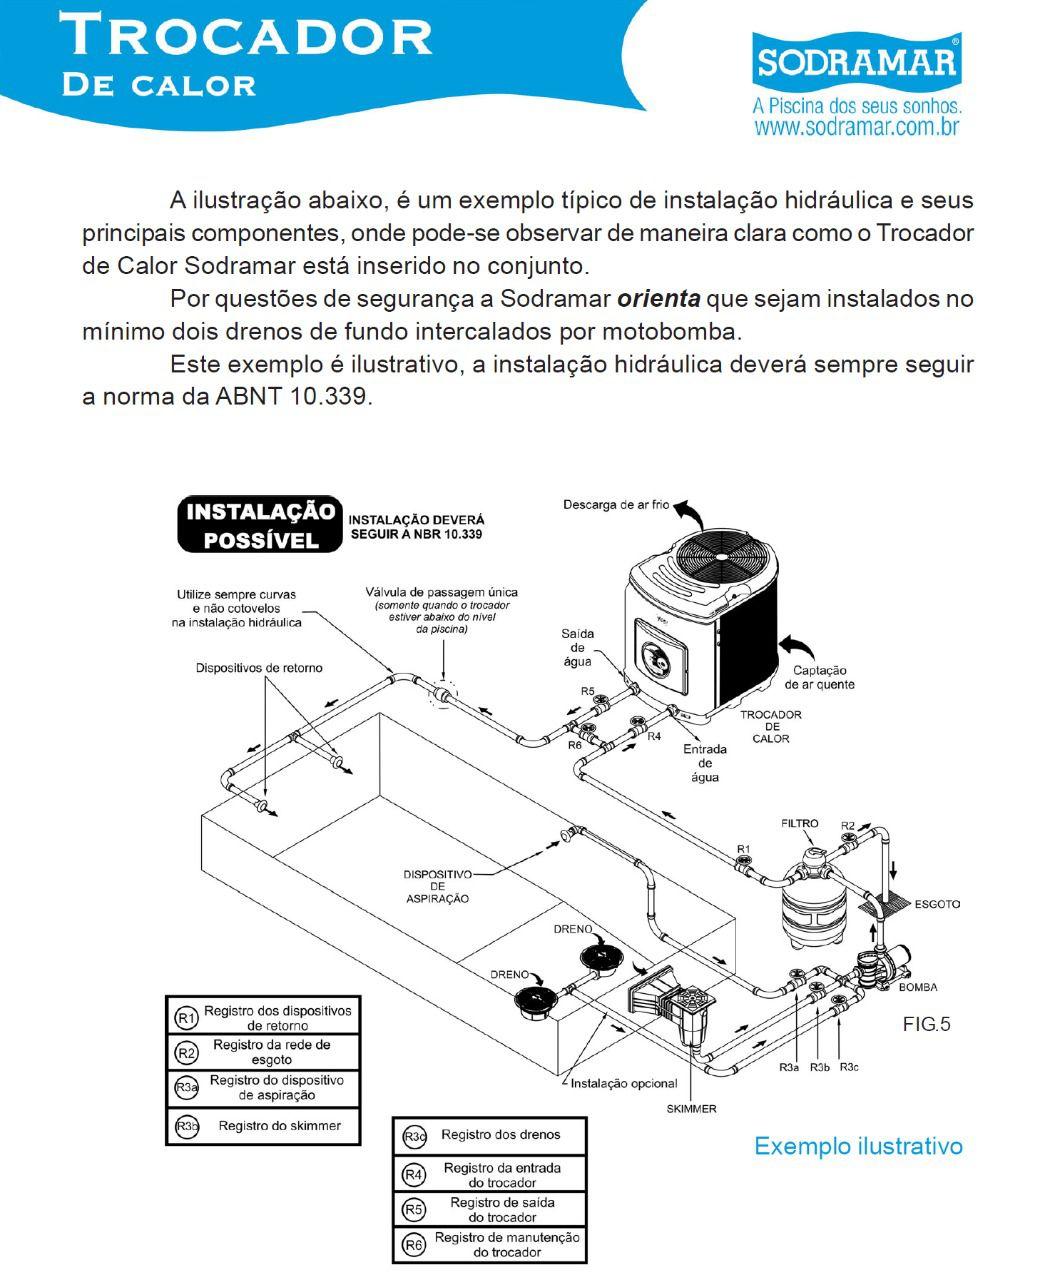 Aquecedor de piscina Yes - Trocador de Calor SD-80 Trif 380V